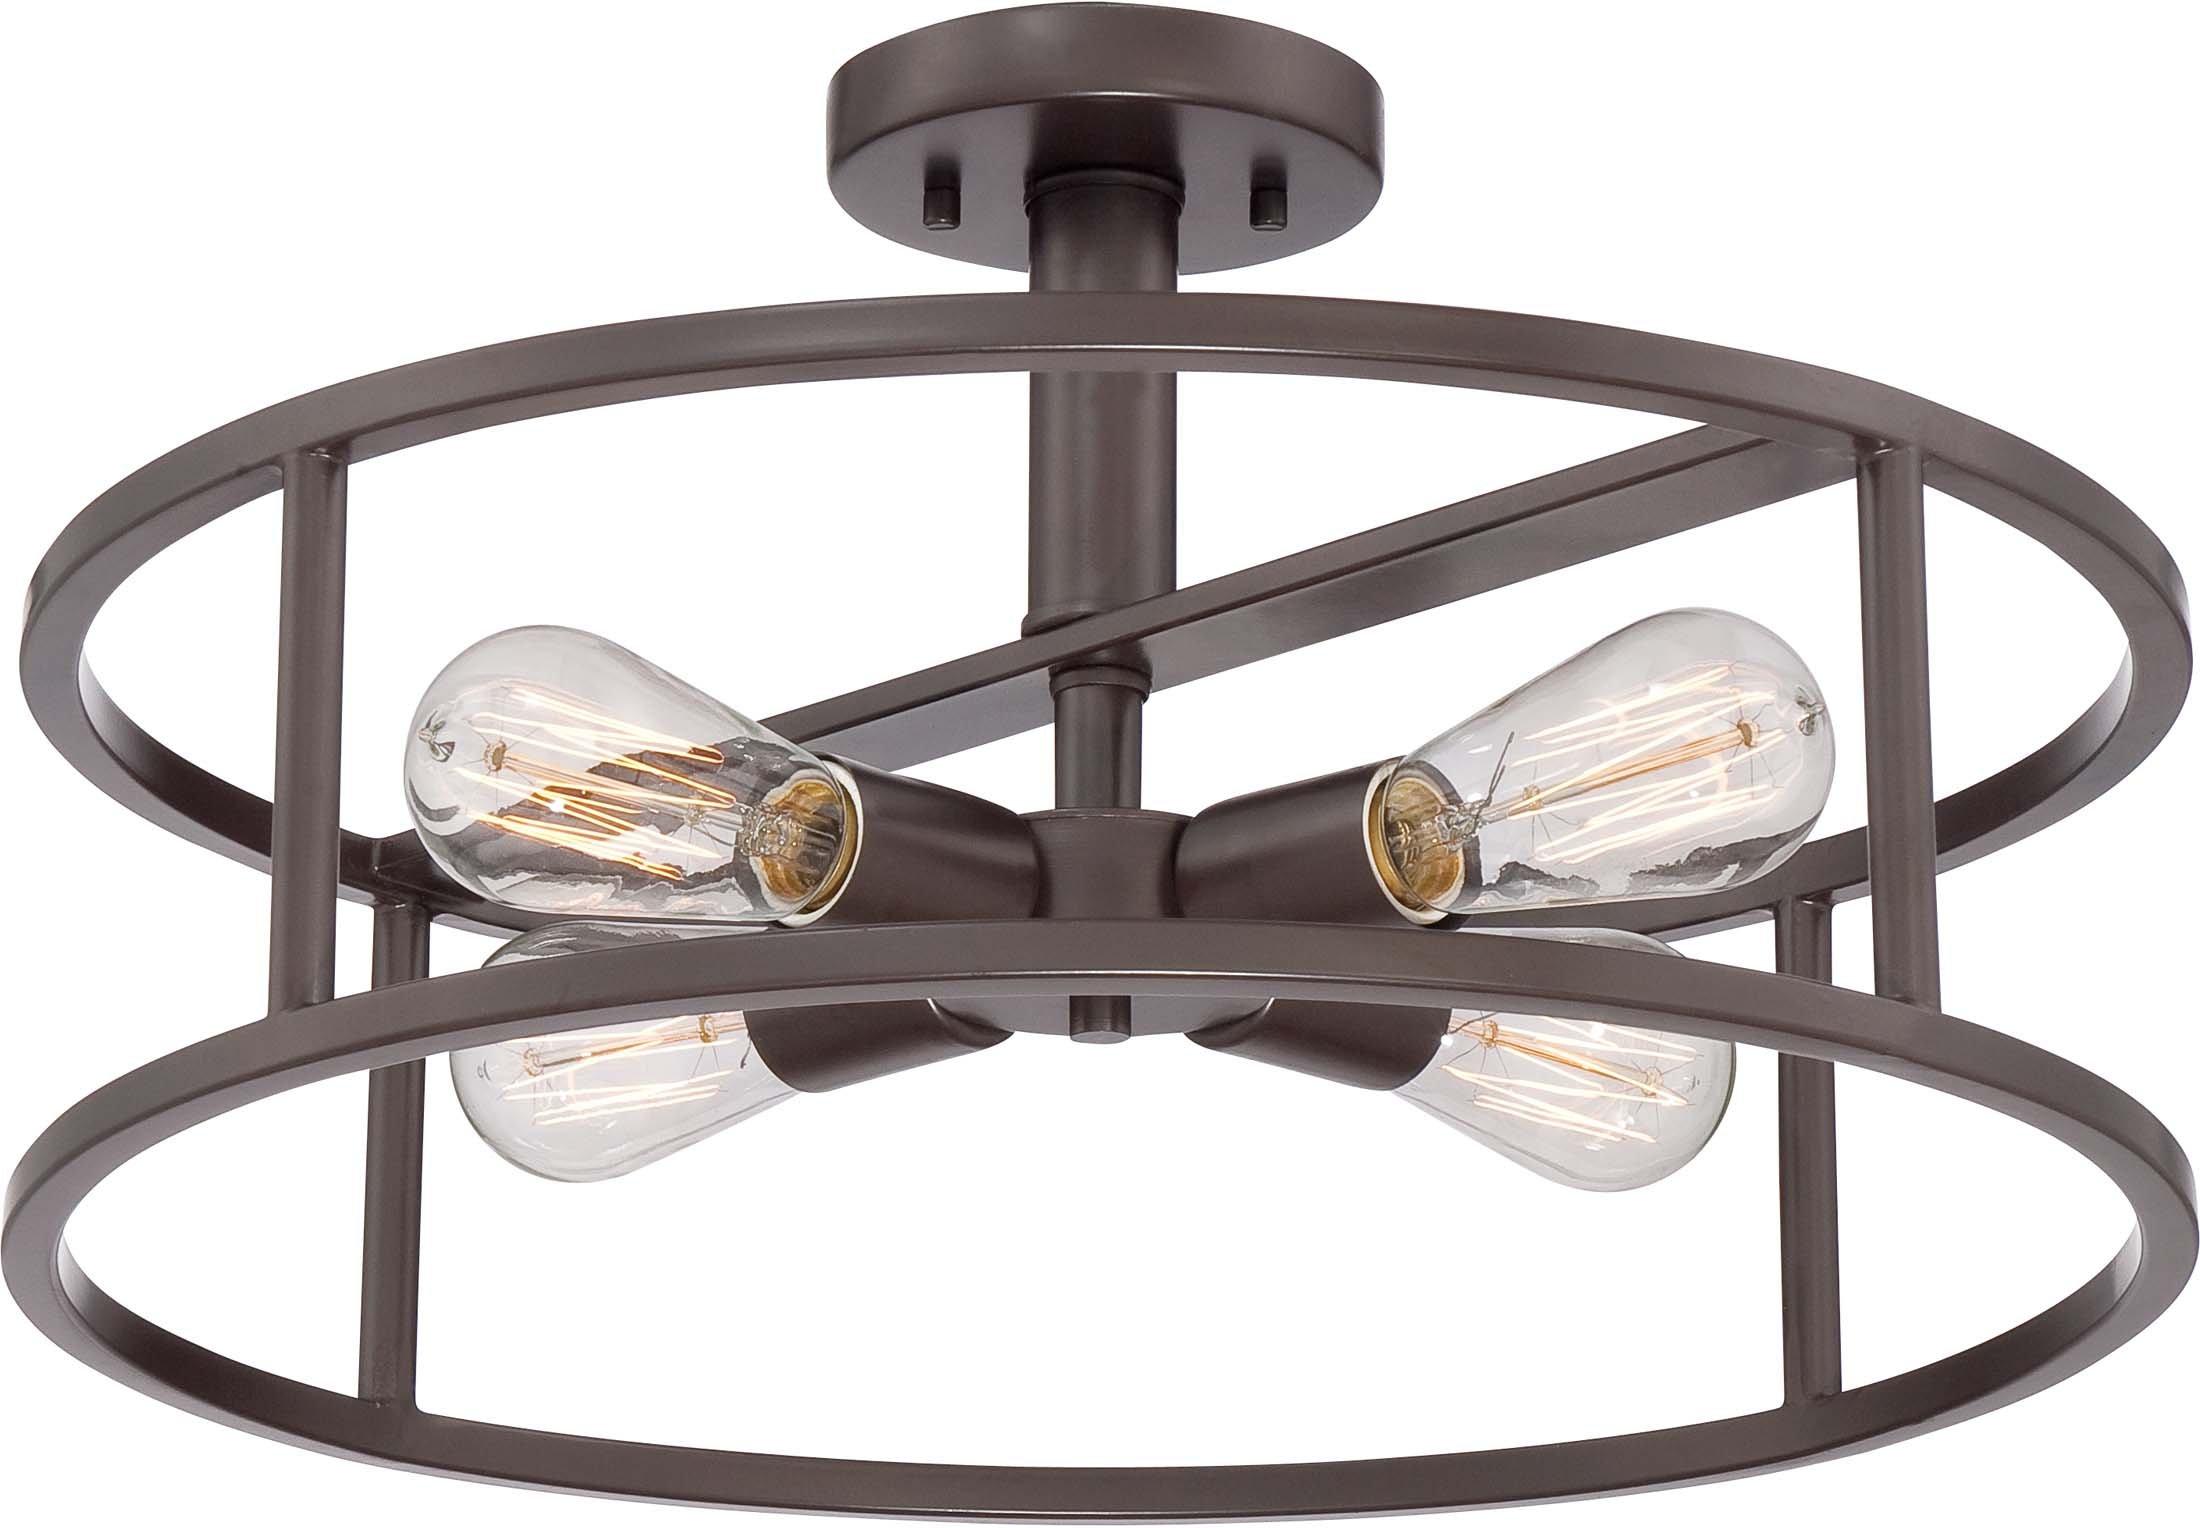 Amazon Com Quoizel Nhr1718wt New Harbor Vintage Semi Flush Mount Ceiling Lighting 4 Light 400 Watts Western Bronze 11 H X 18 W Home Improvement